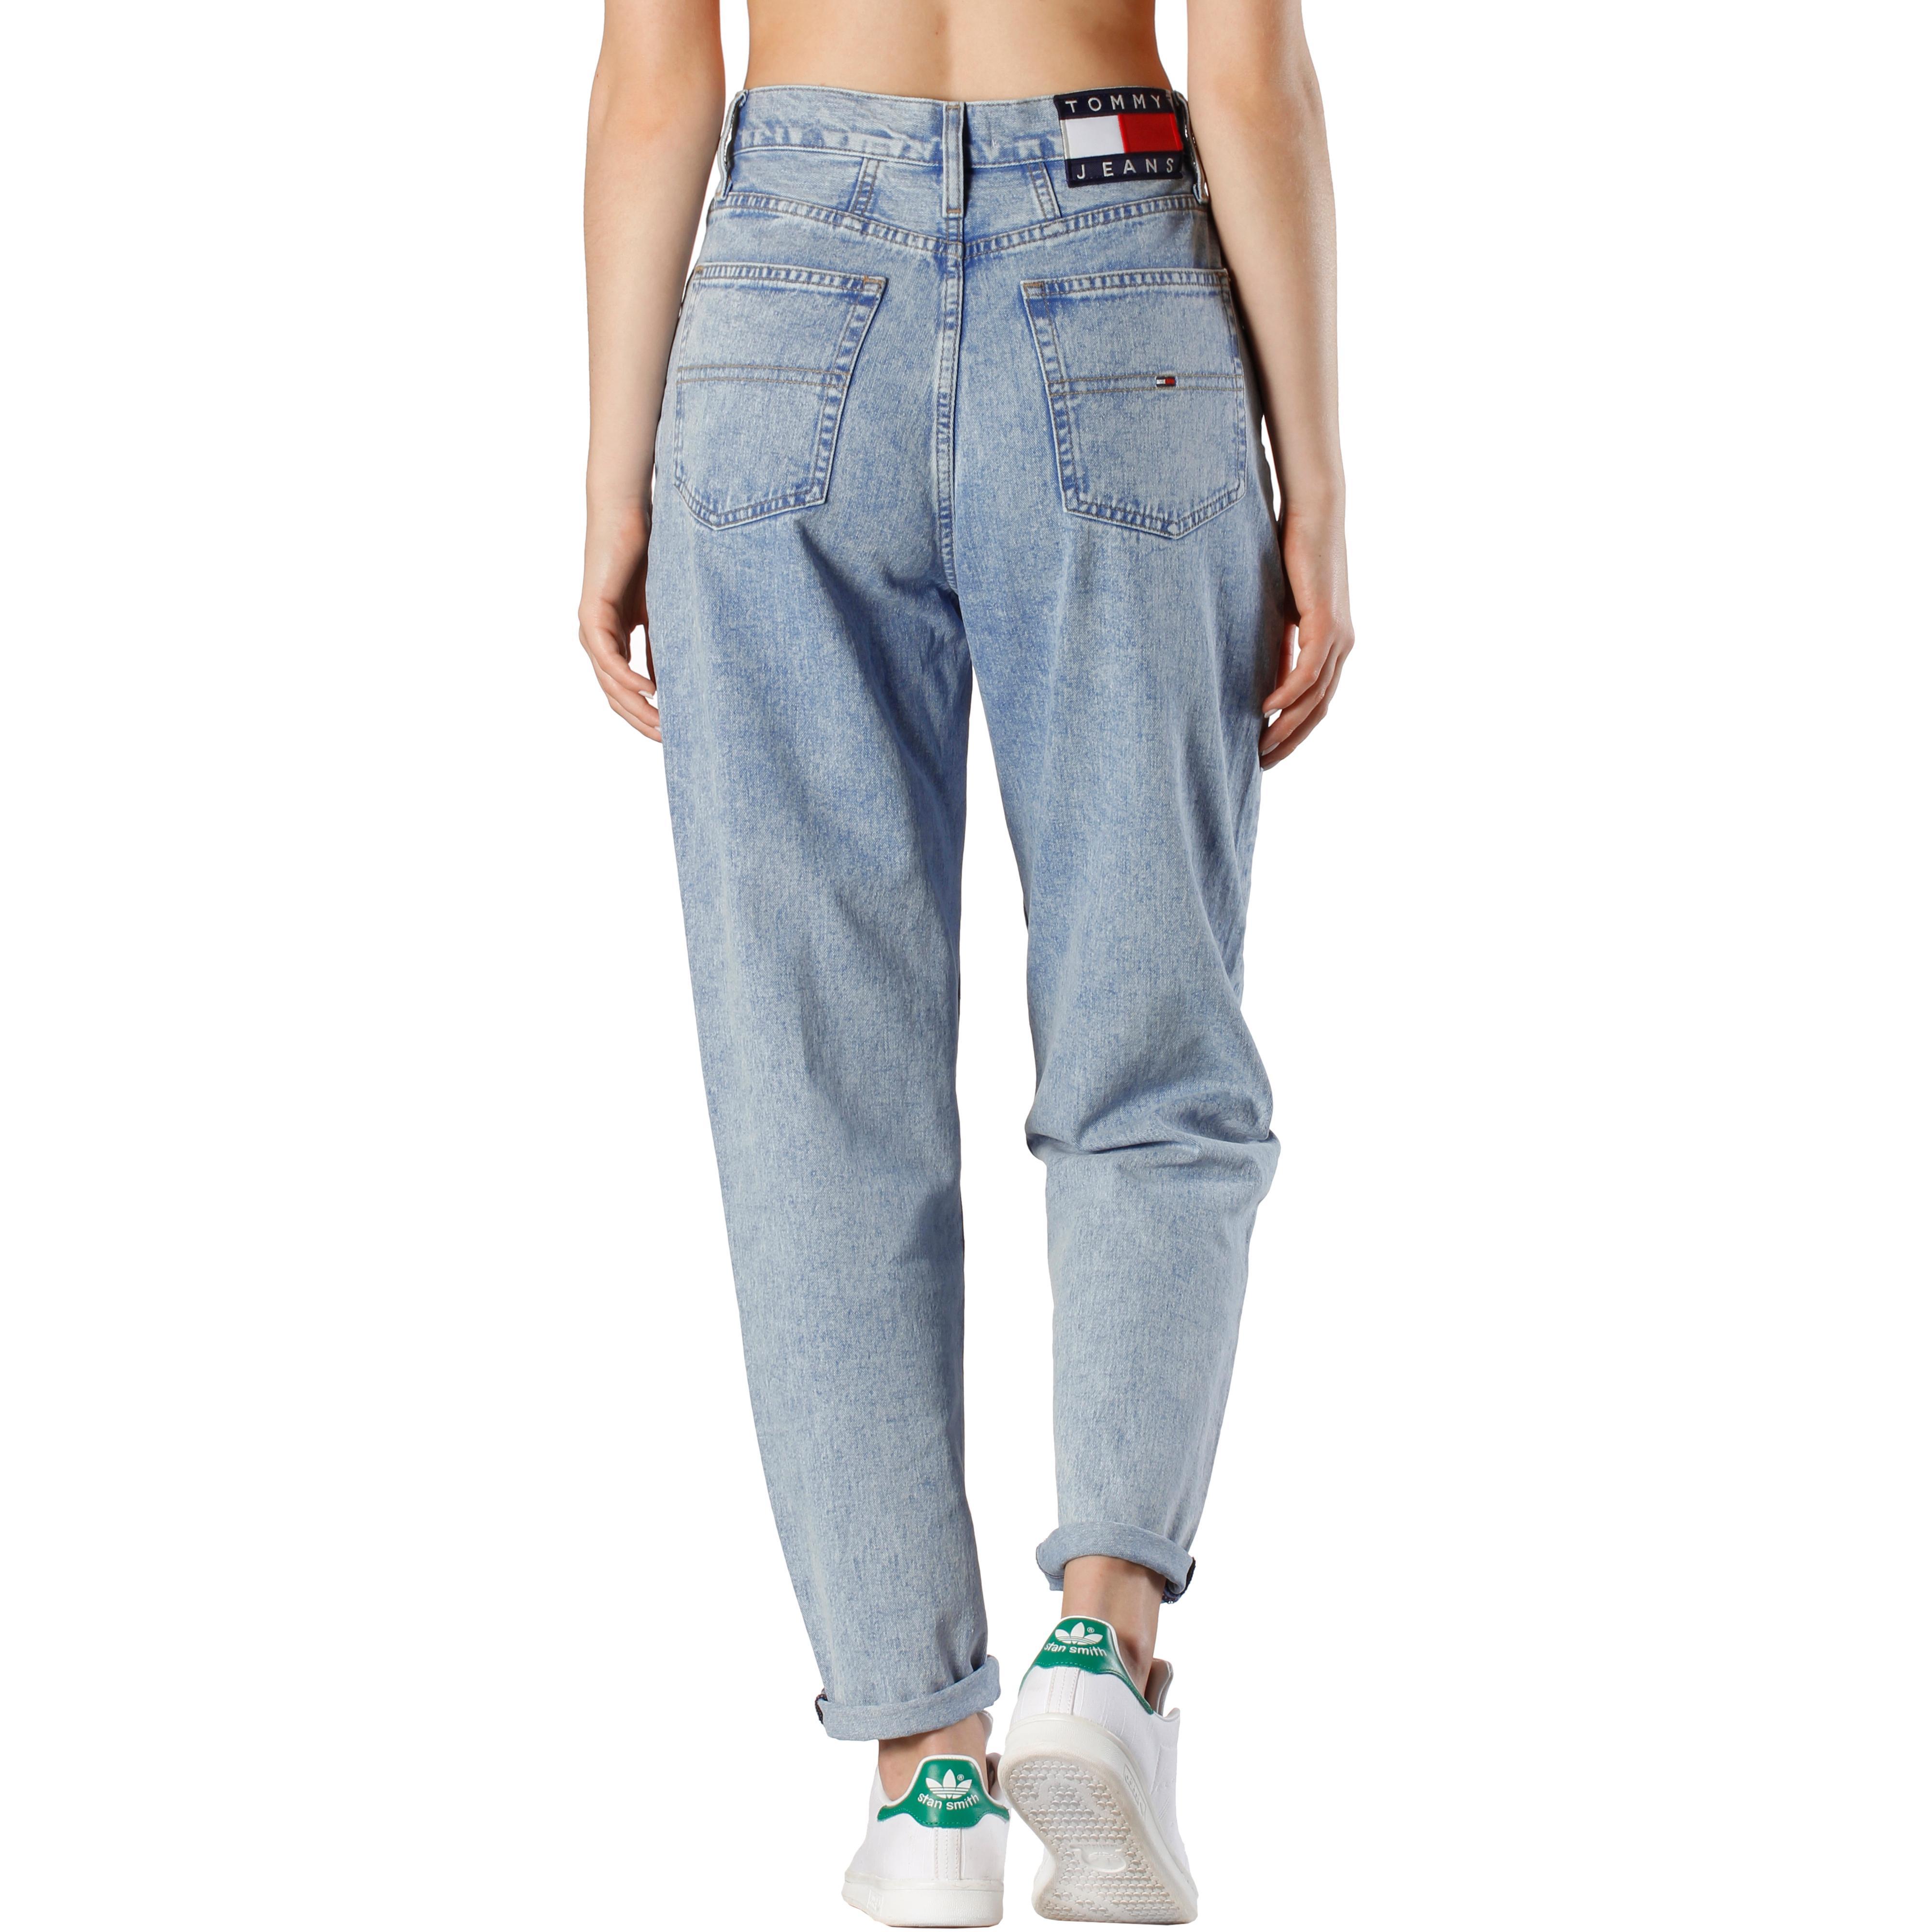 Shop Zu Hy29eiwd A Onlinejetzt 60spot Sale Bis 2019im Jeans MSVzpqU